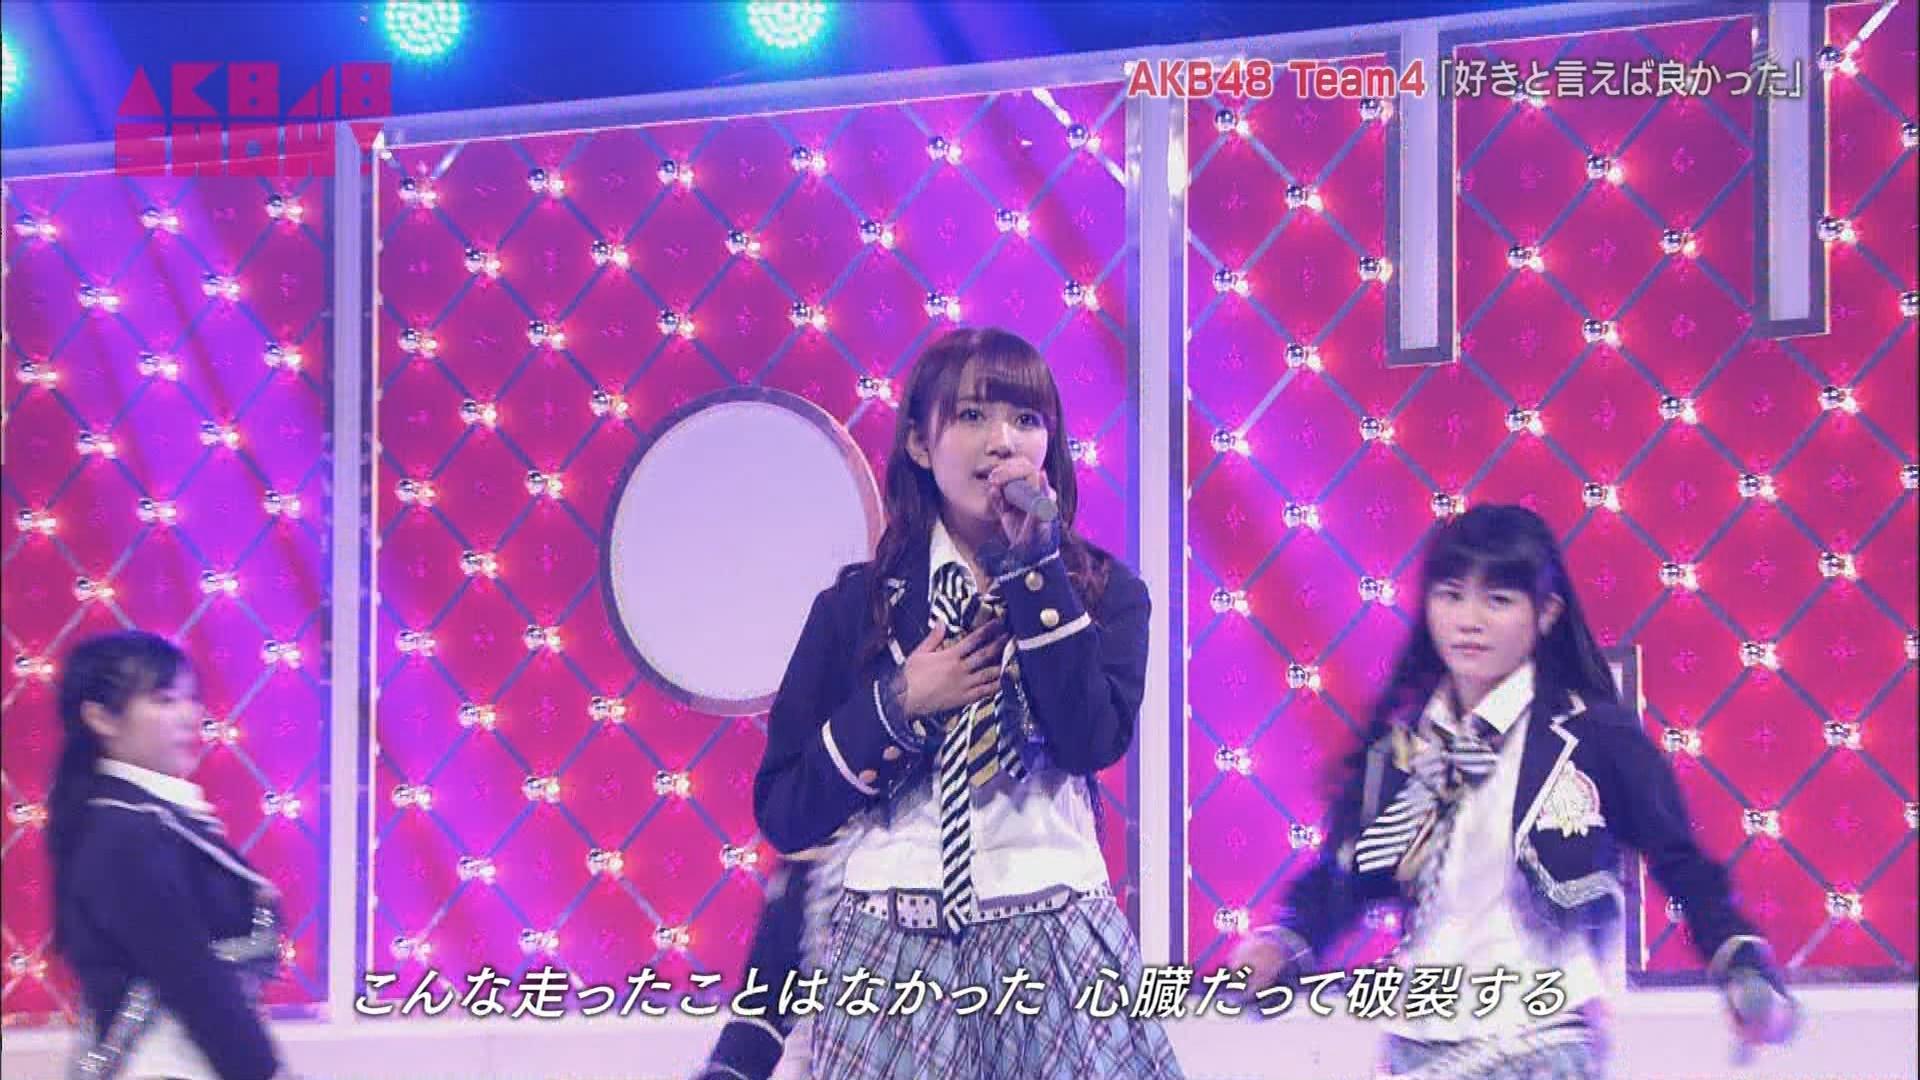 AKB48SHOW チーム4好きといえば良かった 加藤玲奈 20140830 (9)